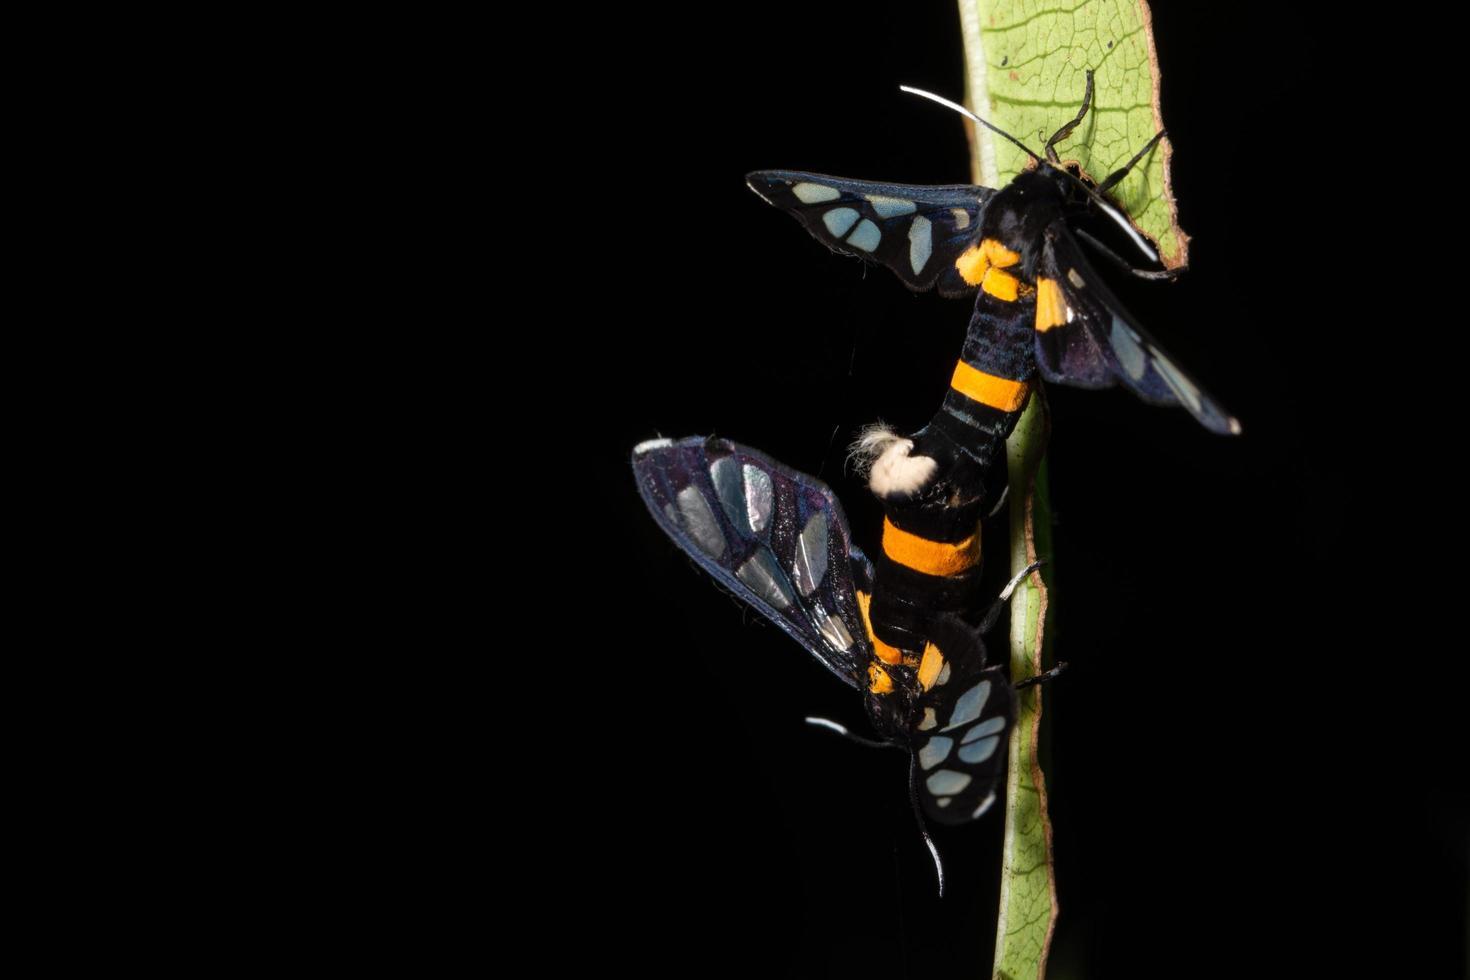 farfalle sulla pianta foto